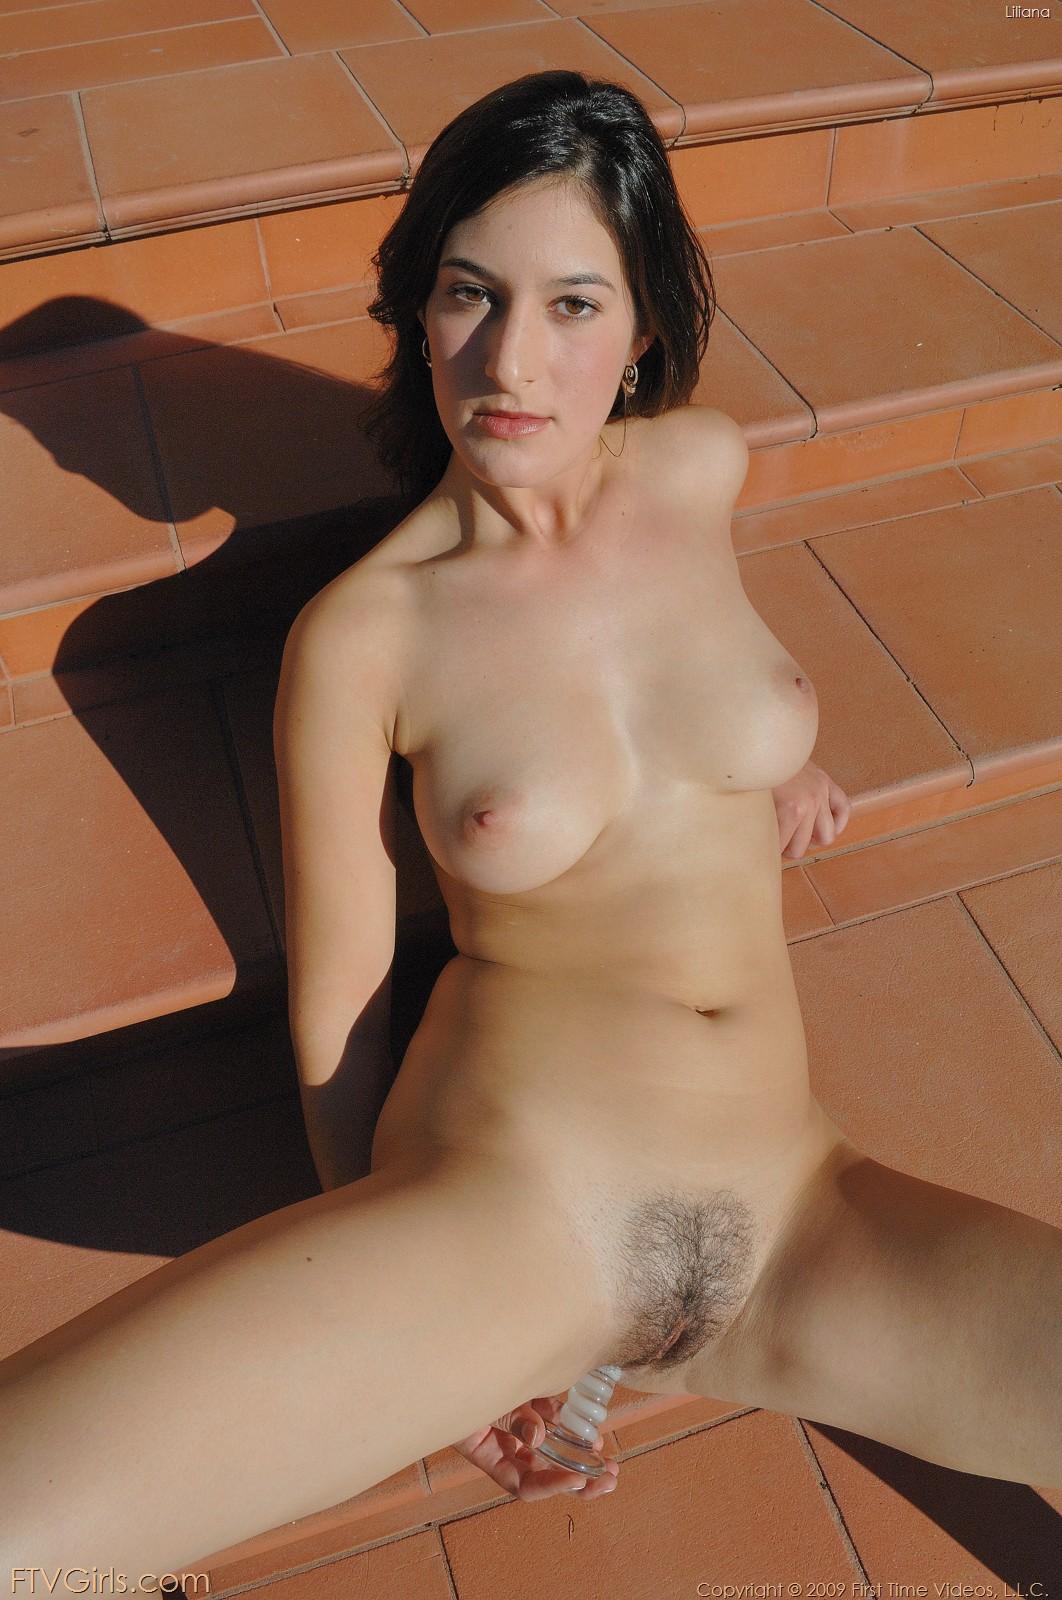 Liliana model pussy nude